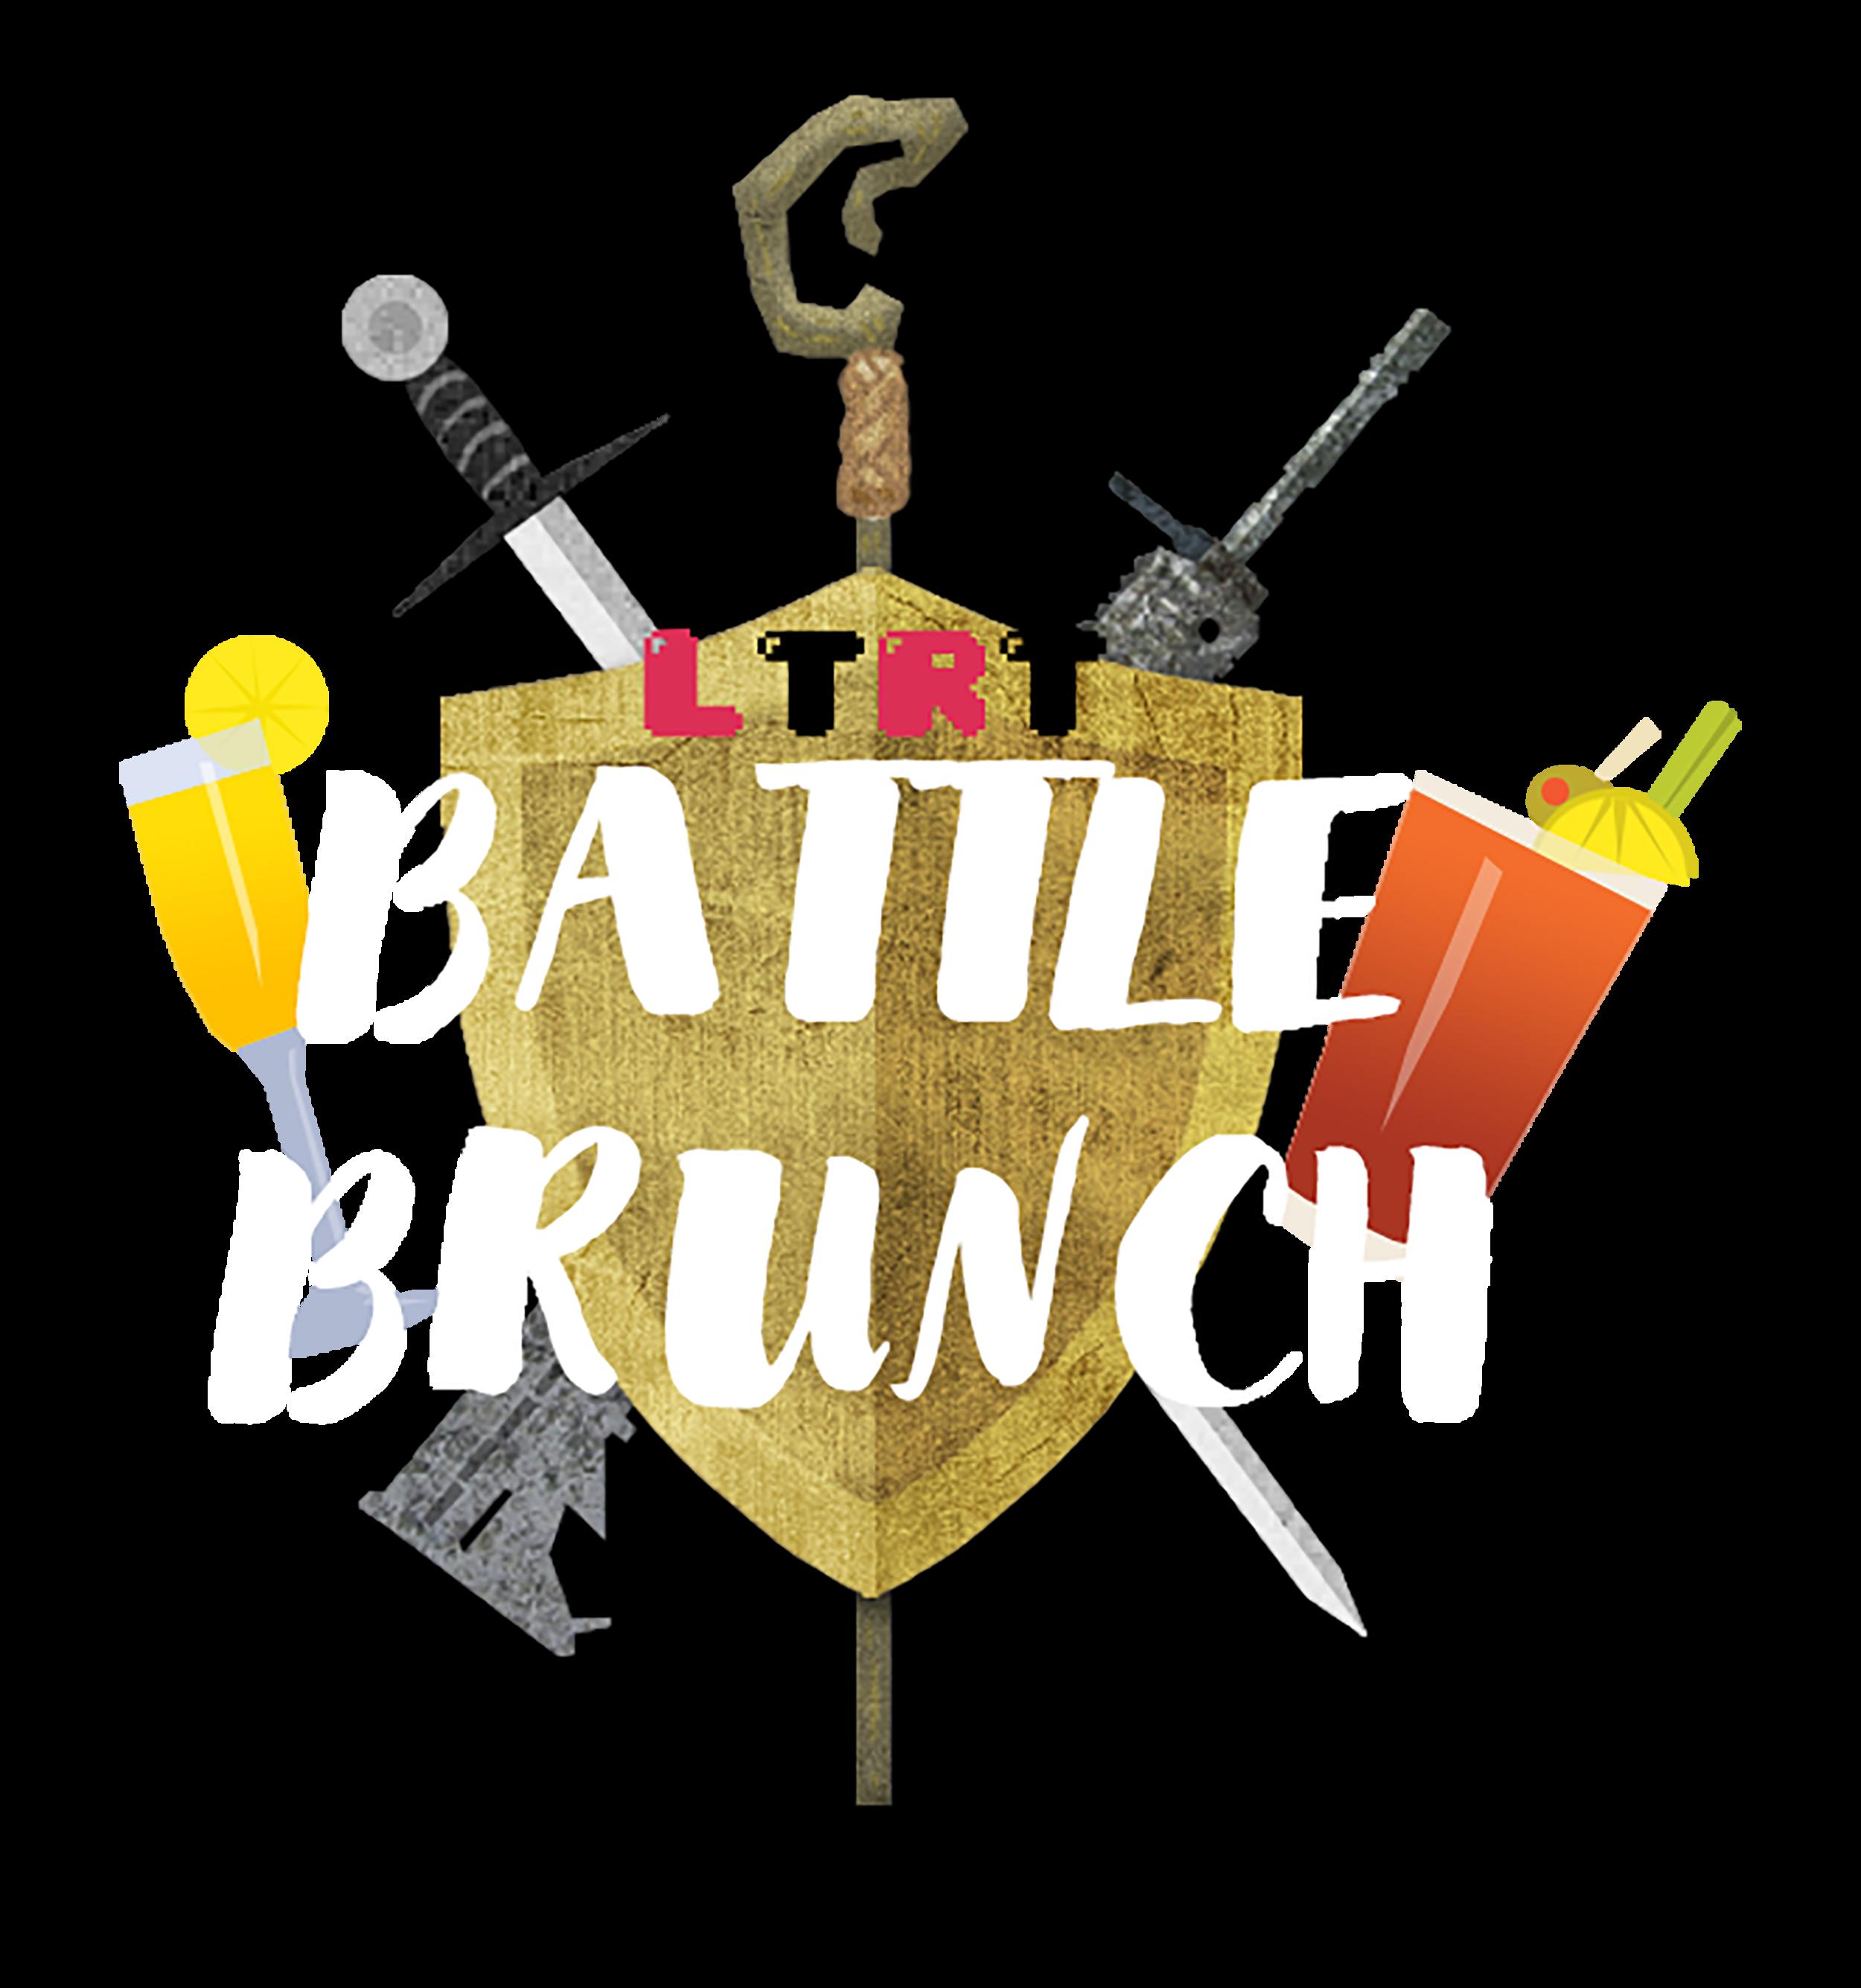 Battle Brunch   A Left Trigger Right Trigger video series.